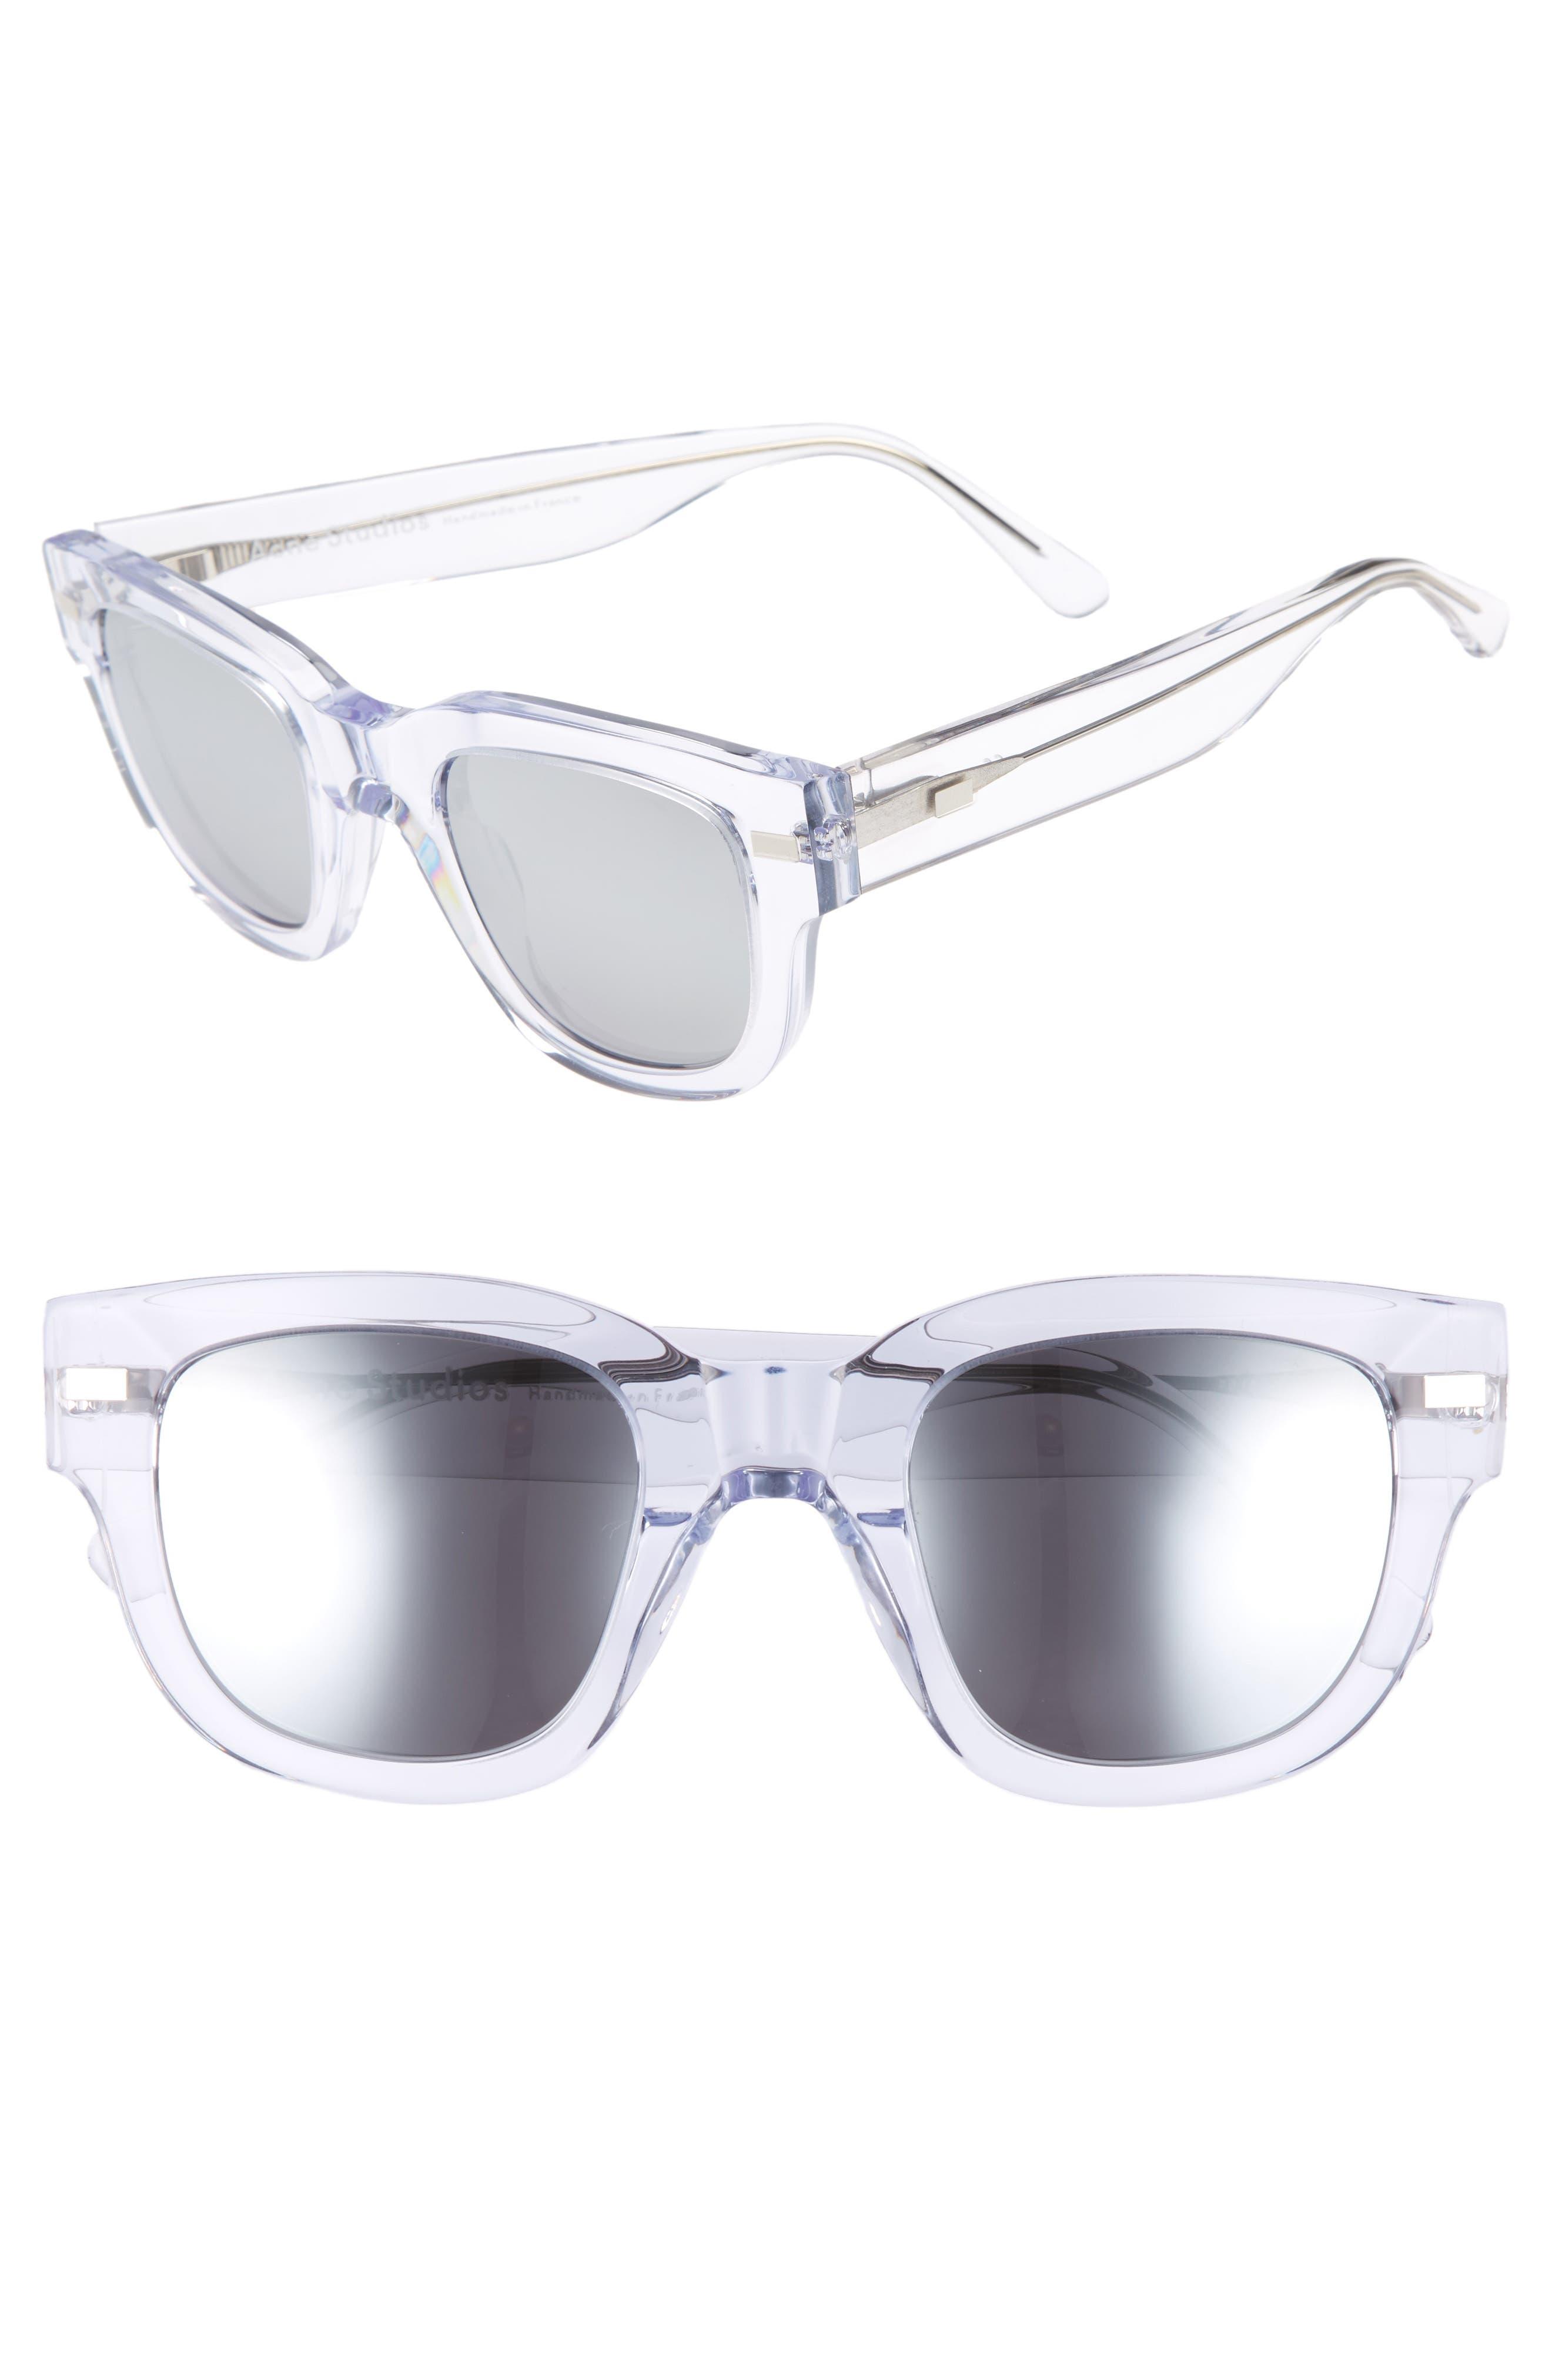 47mm Sunglasses,                             Main thumbnail 1, color,